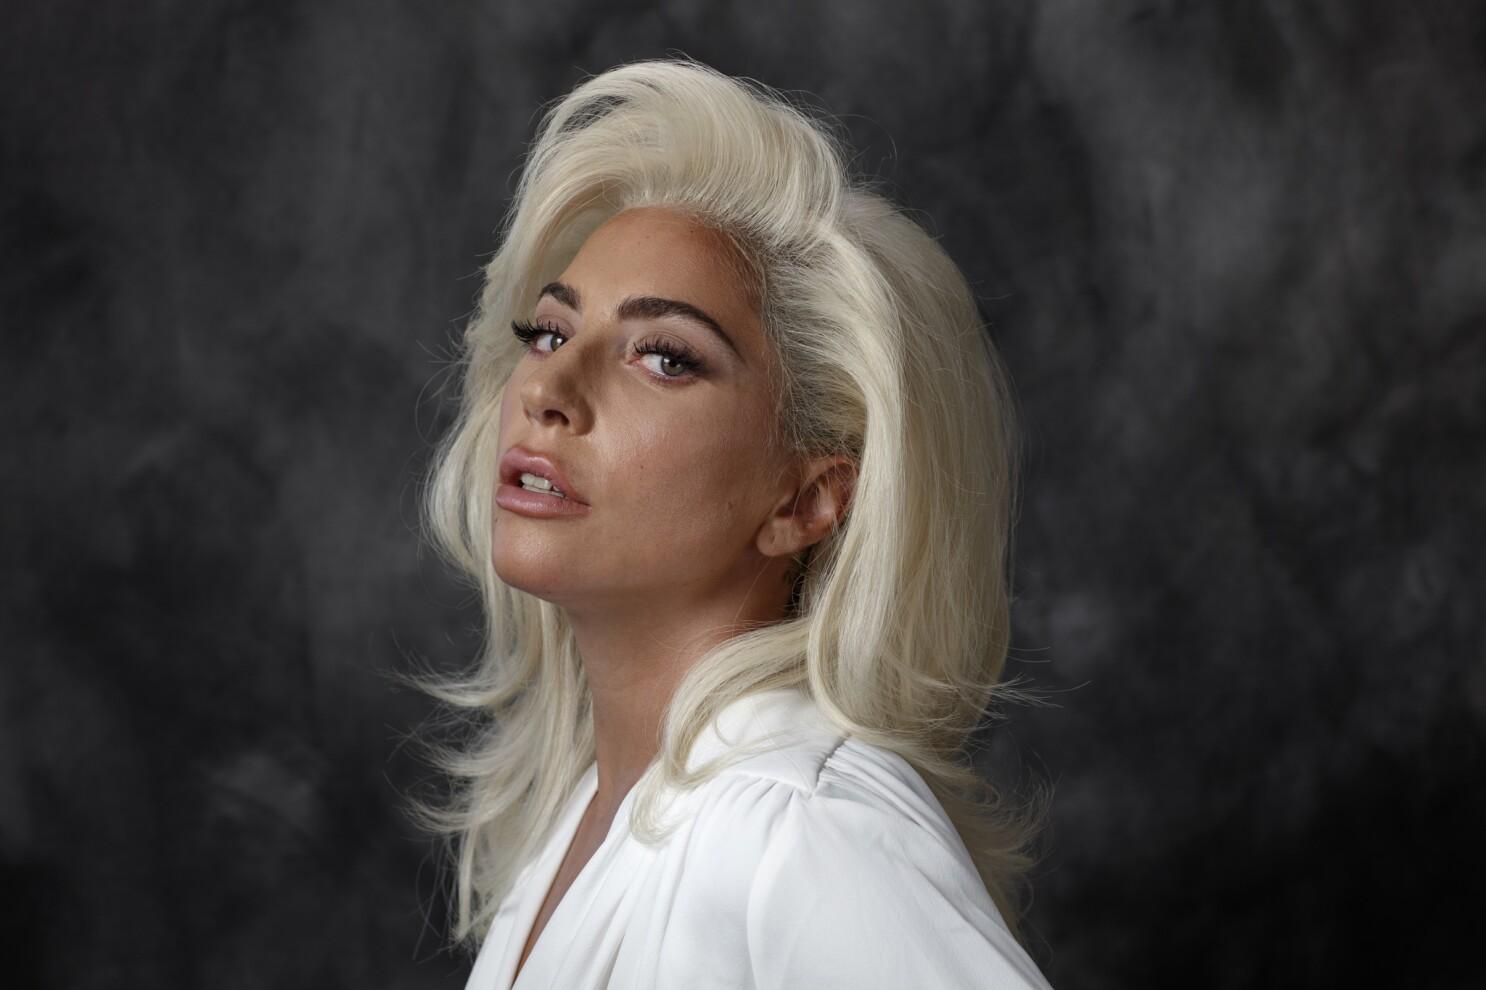 Photos Los Angeles Times Photo Shoot With Lady Gaga Los